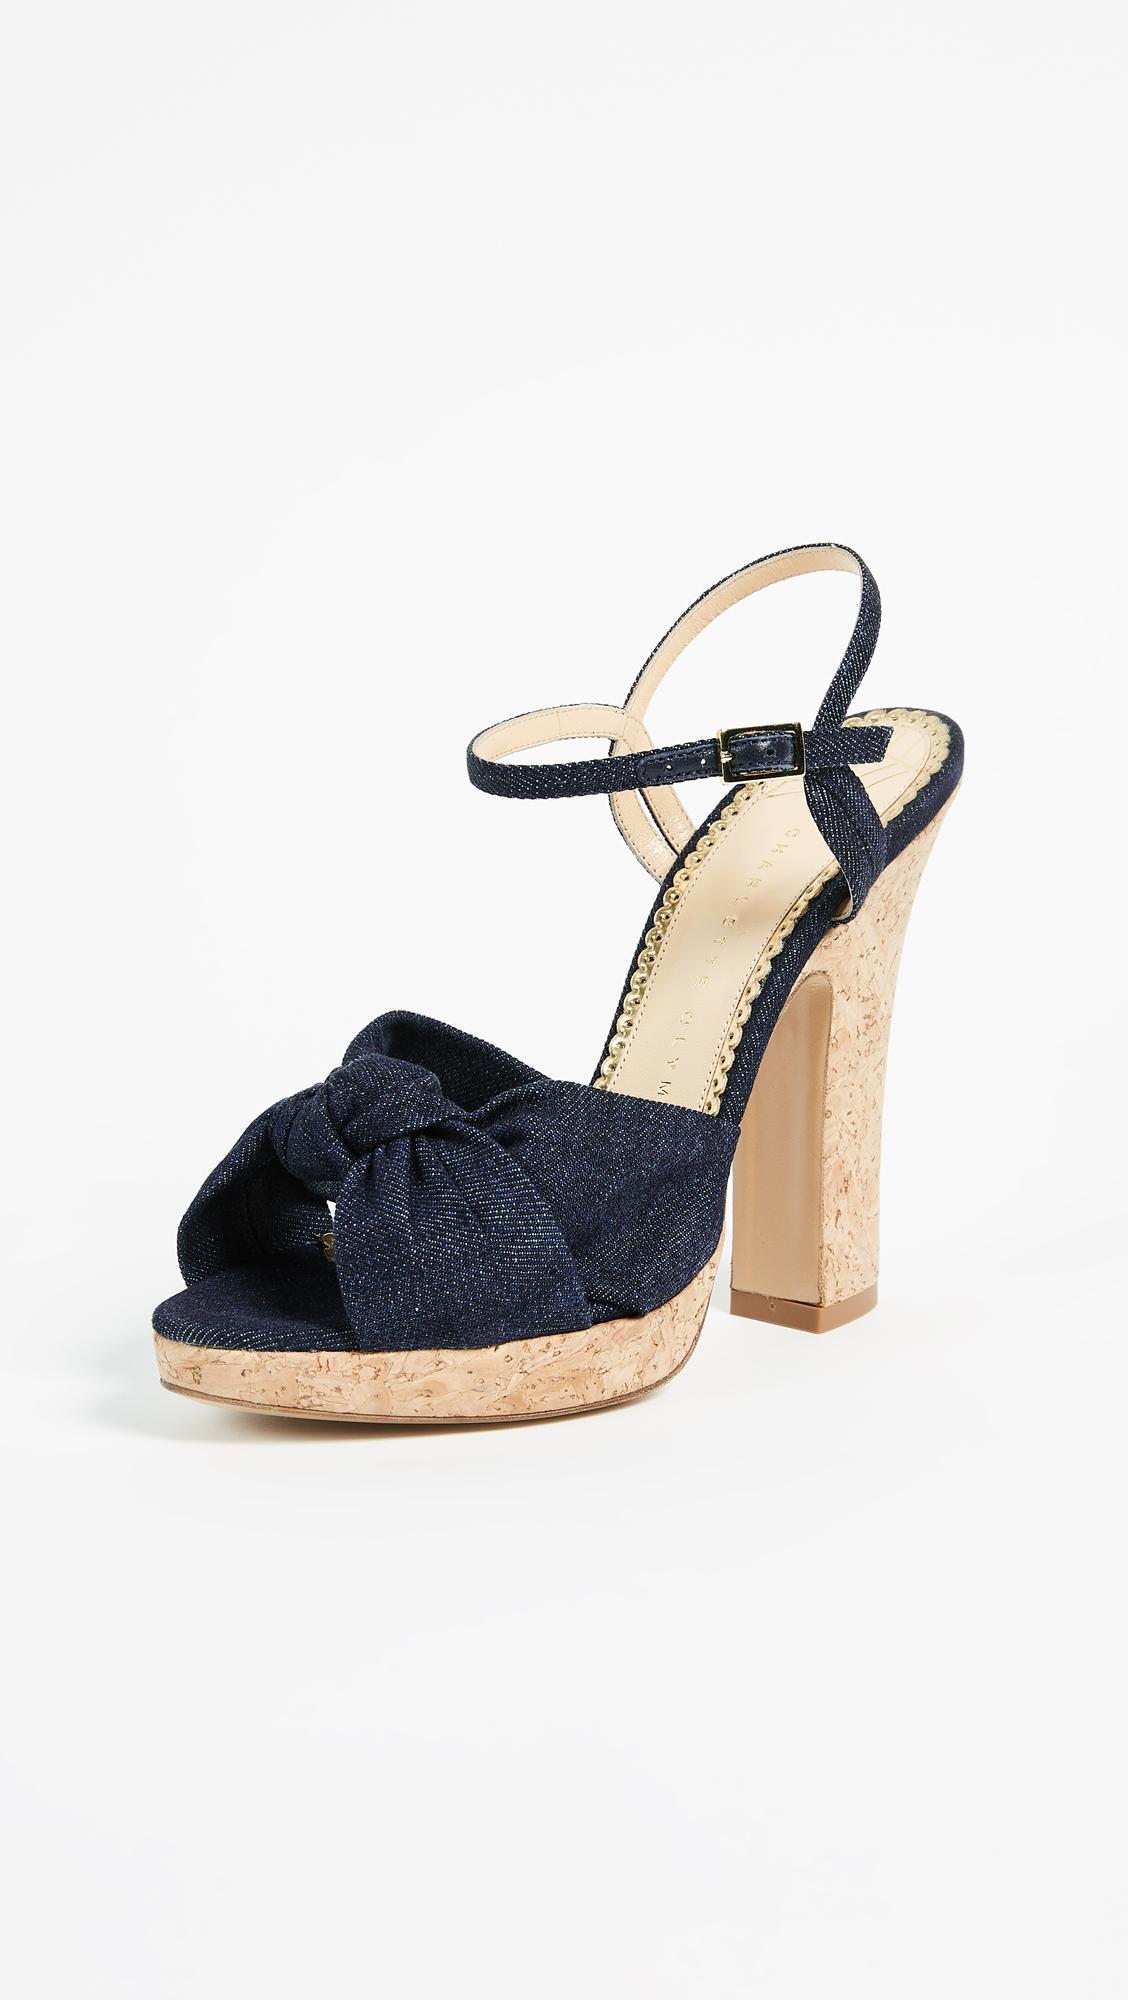 Charlotte Olympia Farrah Metallic Leather Platform Sandals Gr. IT 37 29WE2dwDm